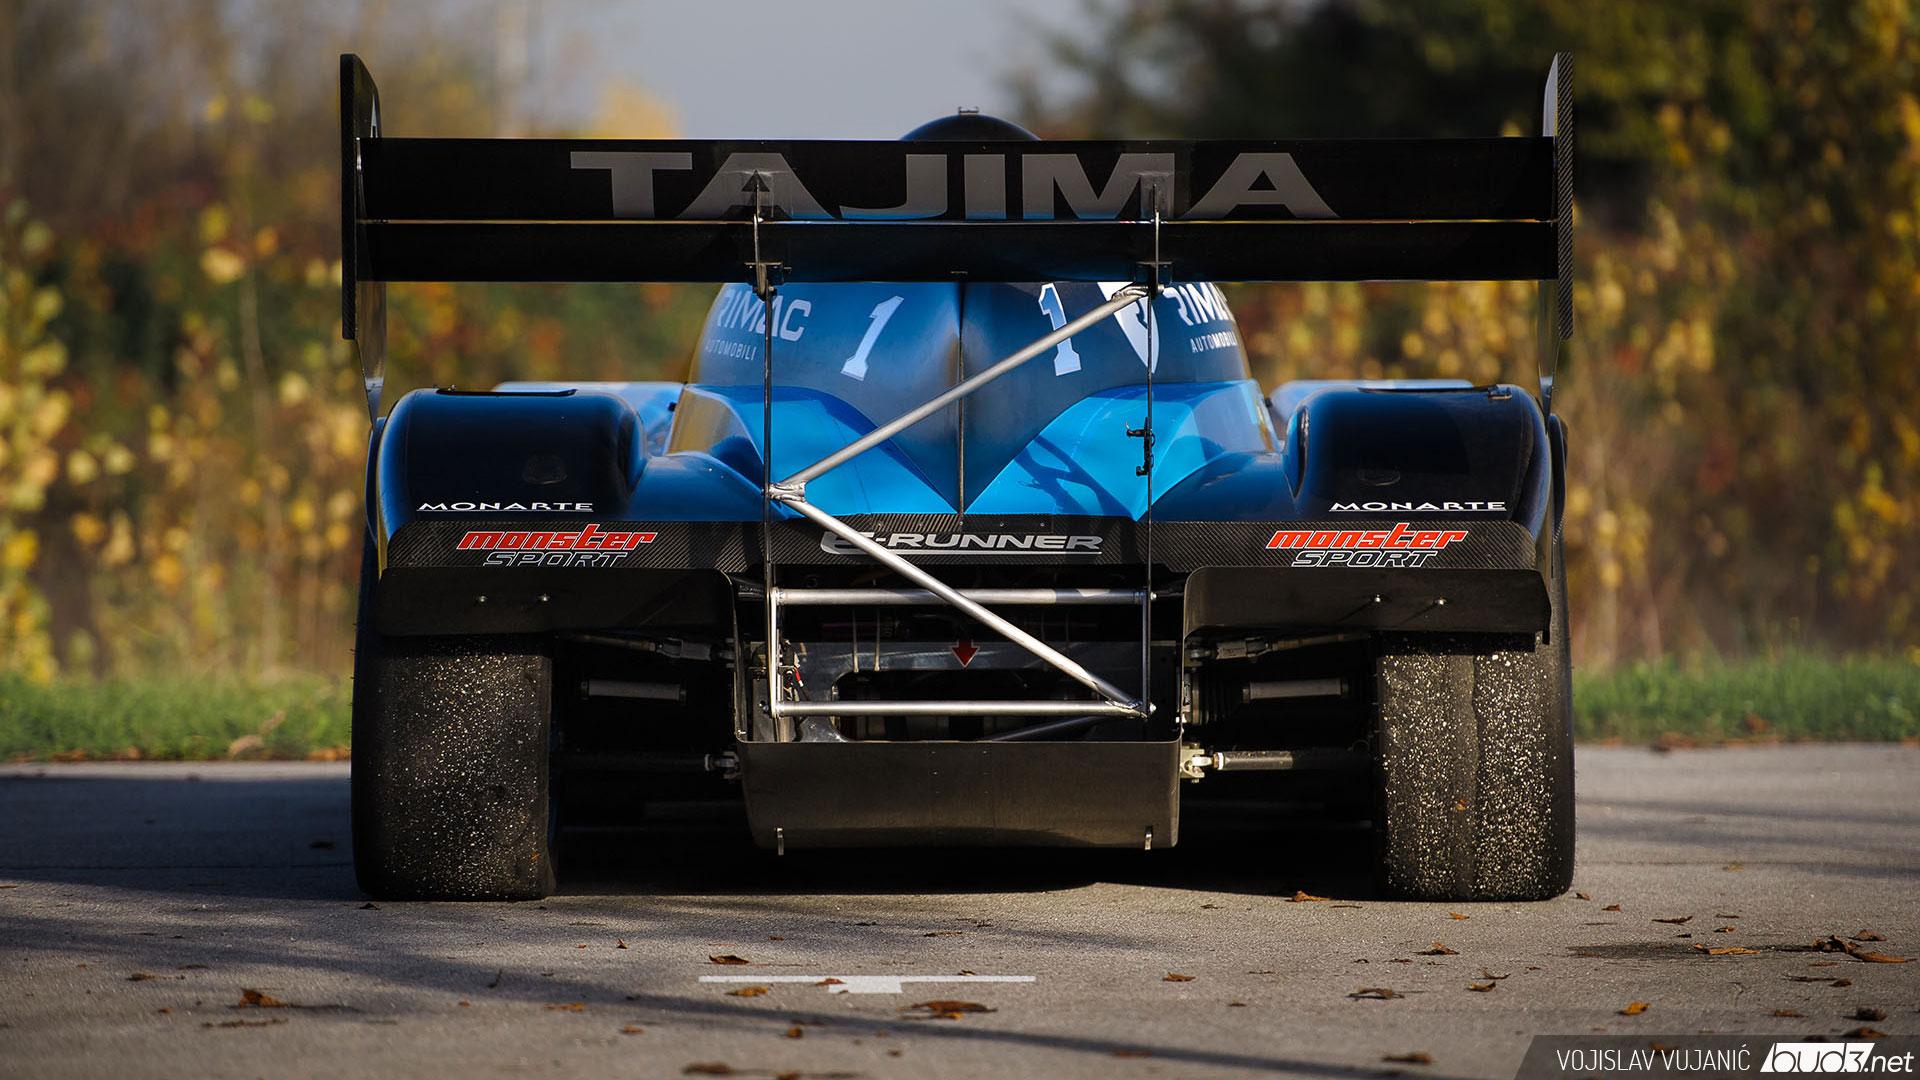 Tajima Monster Rimac - eRunner